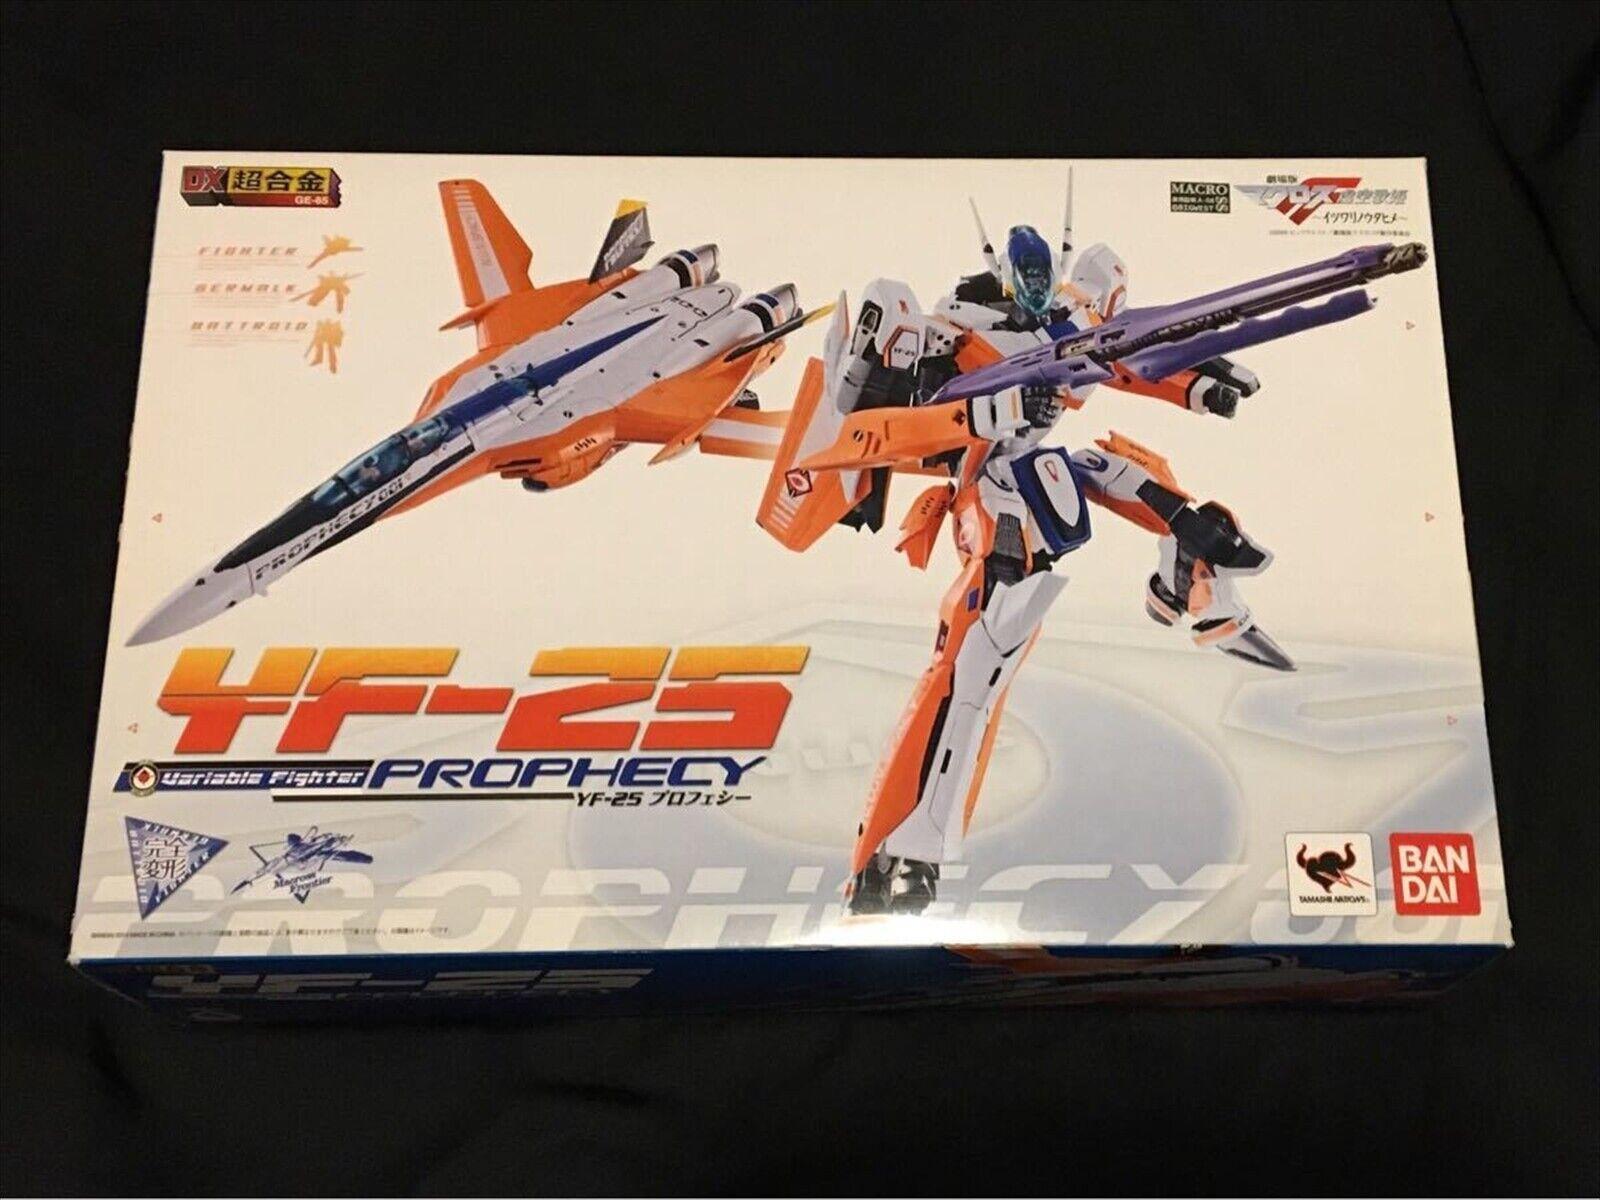 Beai DX Chogokin Macross davantiier YF-25 Prophecy  azione cifra Japan nuovo  all'ingrosso economico e di alta qualità